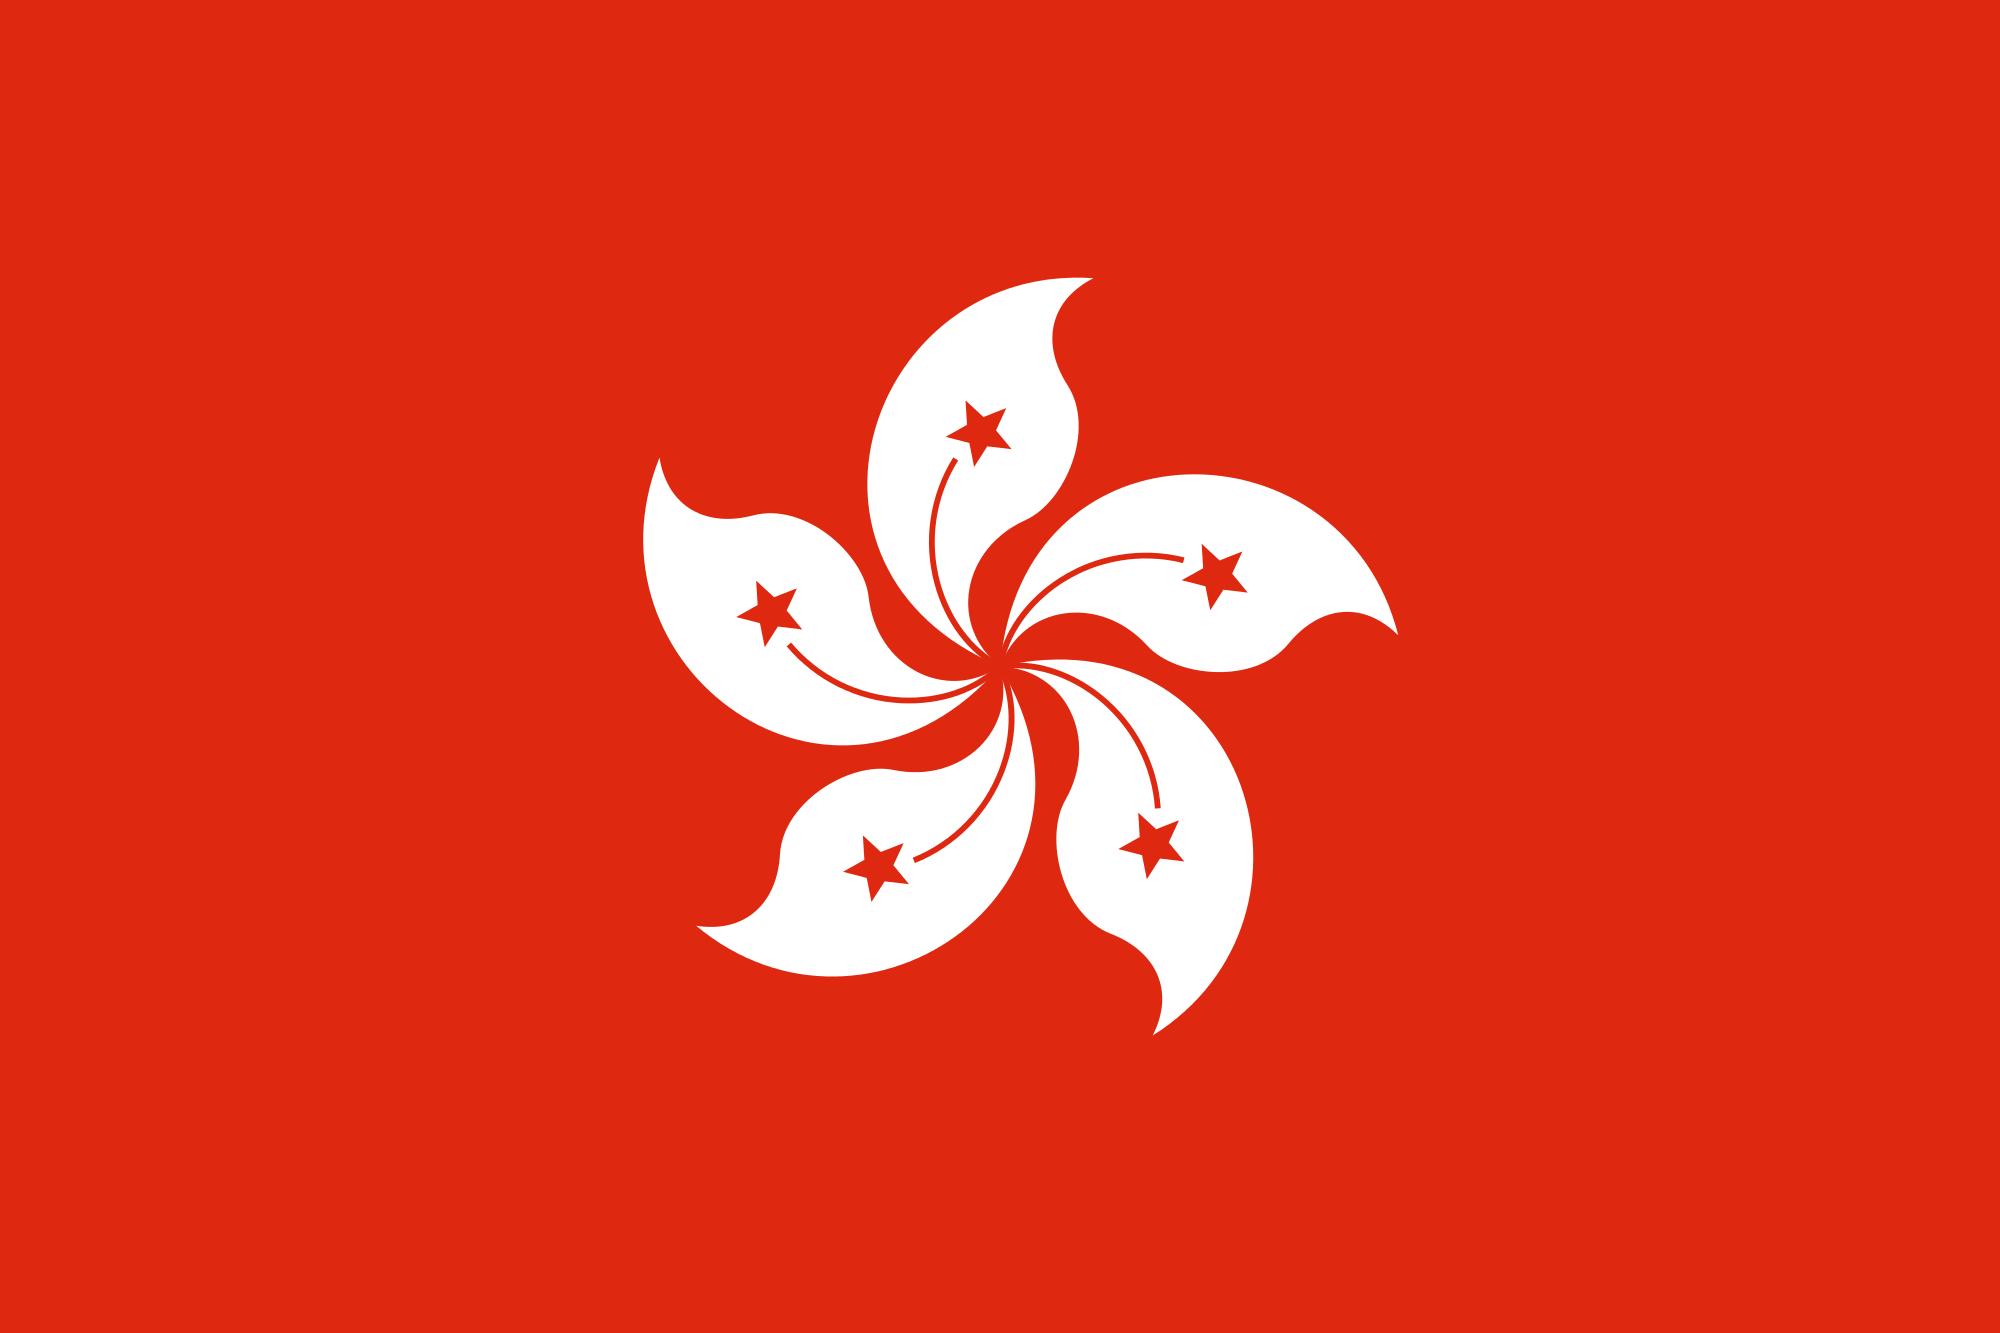 hong kong, страна, Эмблема, логотип, символ - Обои HD - Профессор falken.com